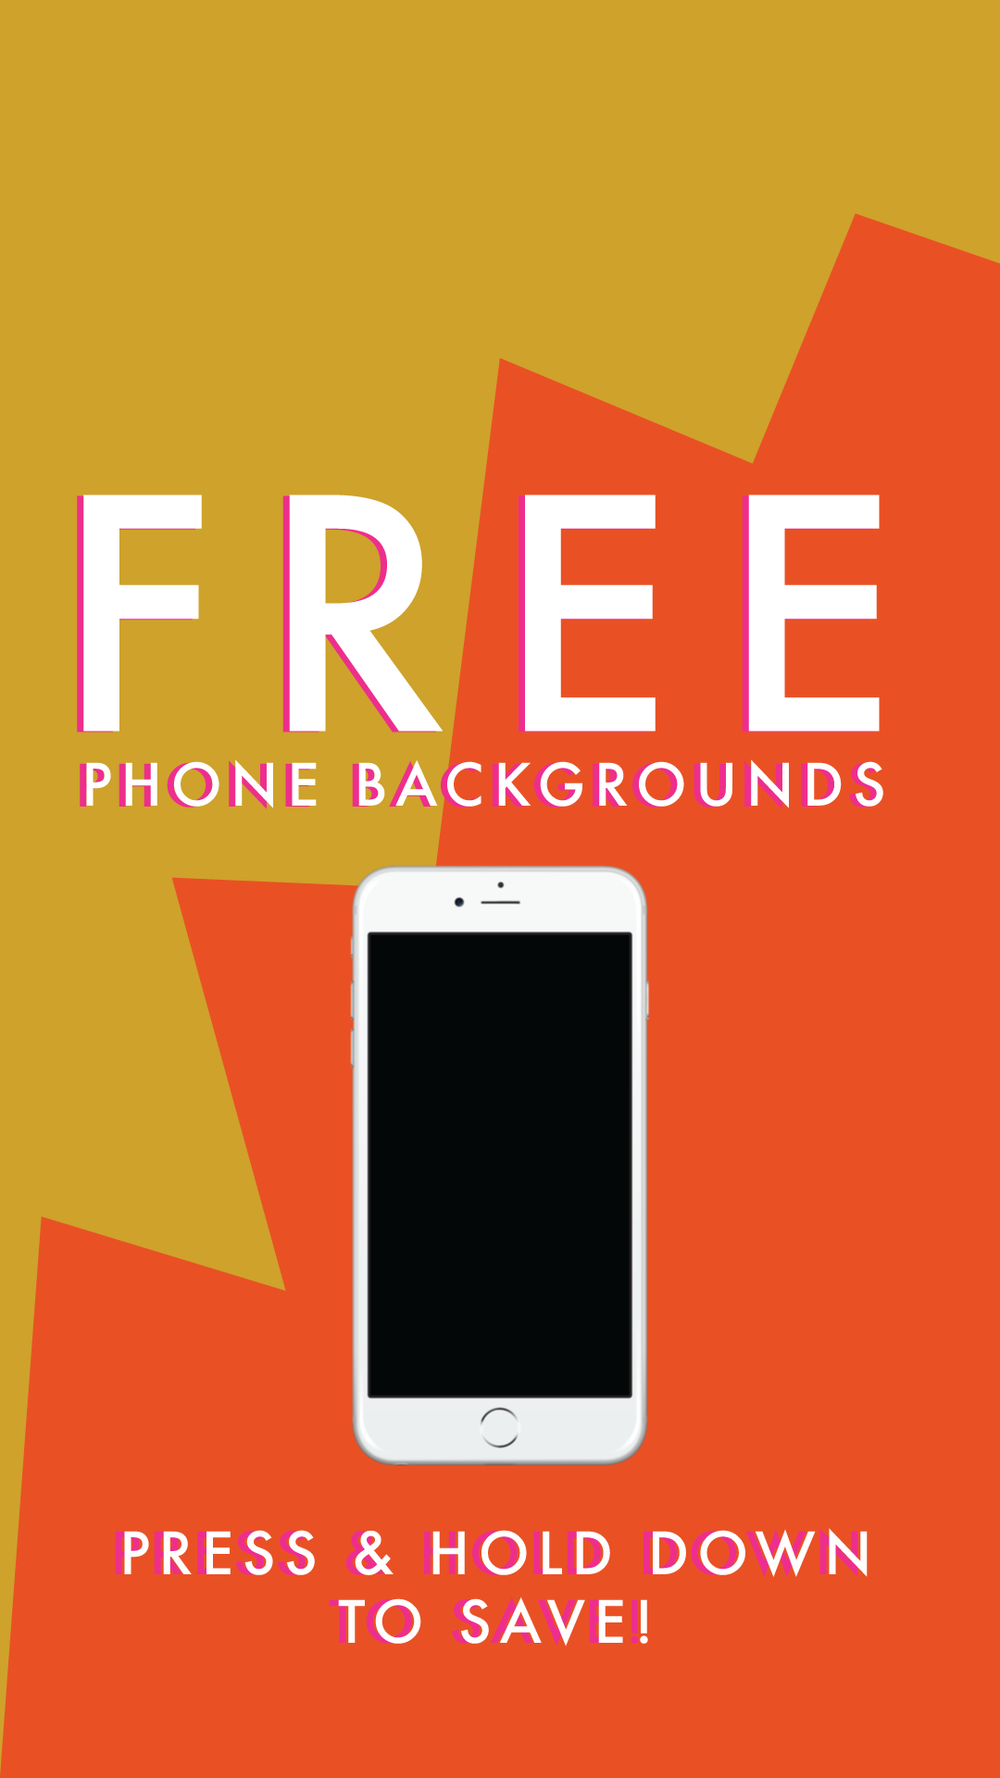 FREE Phone Backgrounds | Jordan Hefler